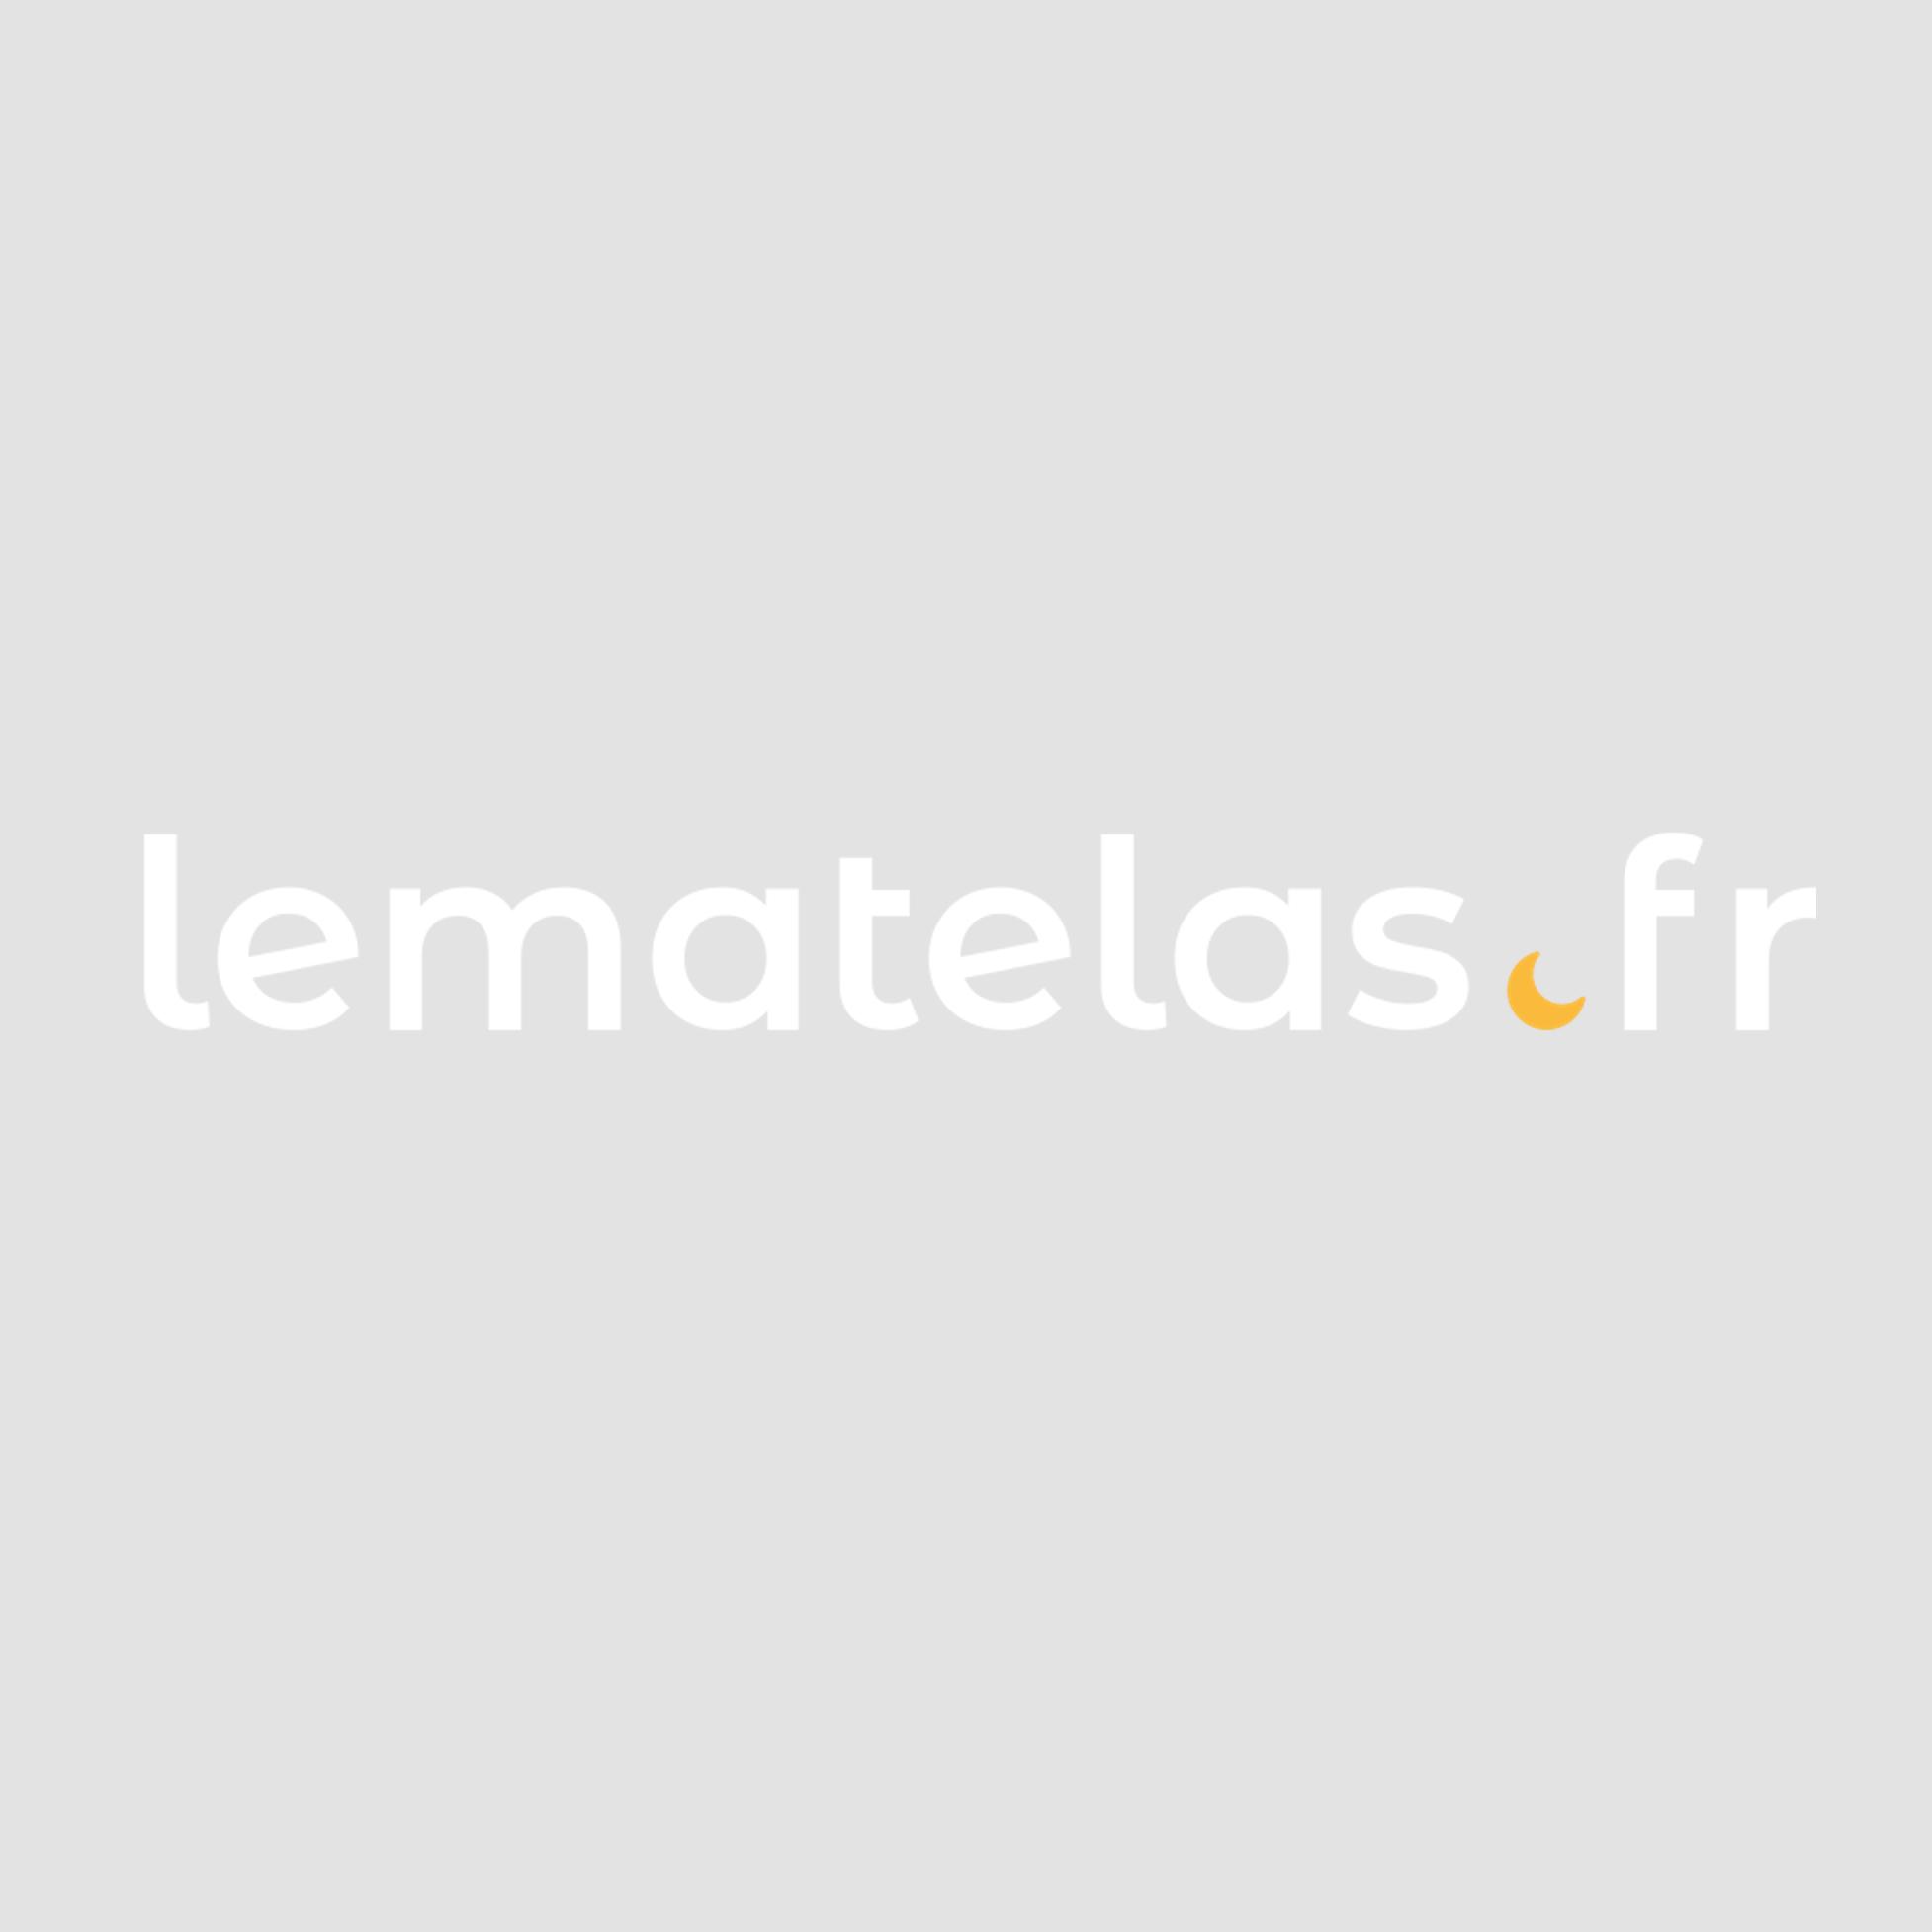 Ensemble Lit futon style japonais + matelas futon noir 160x200